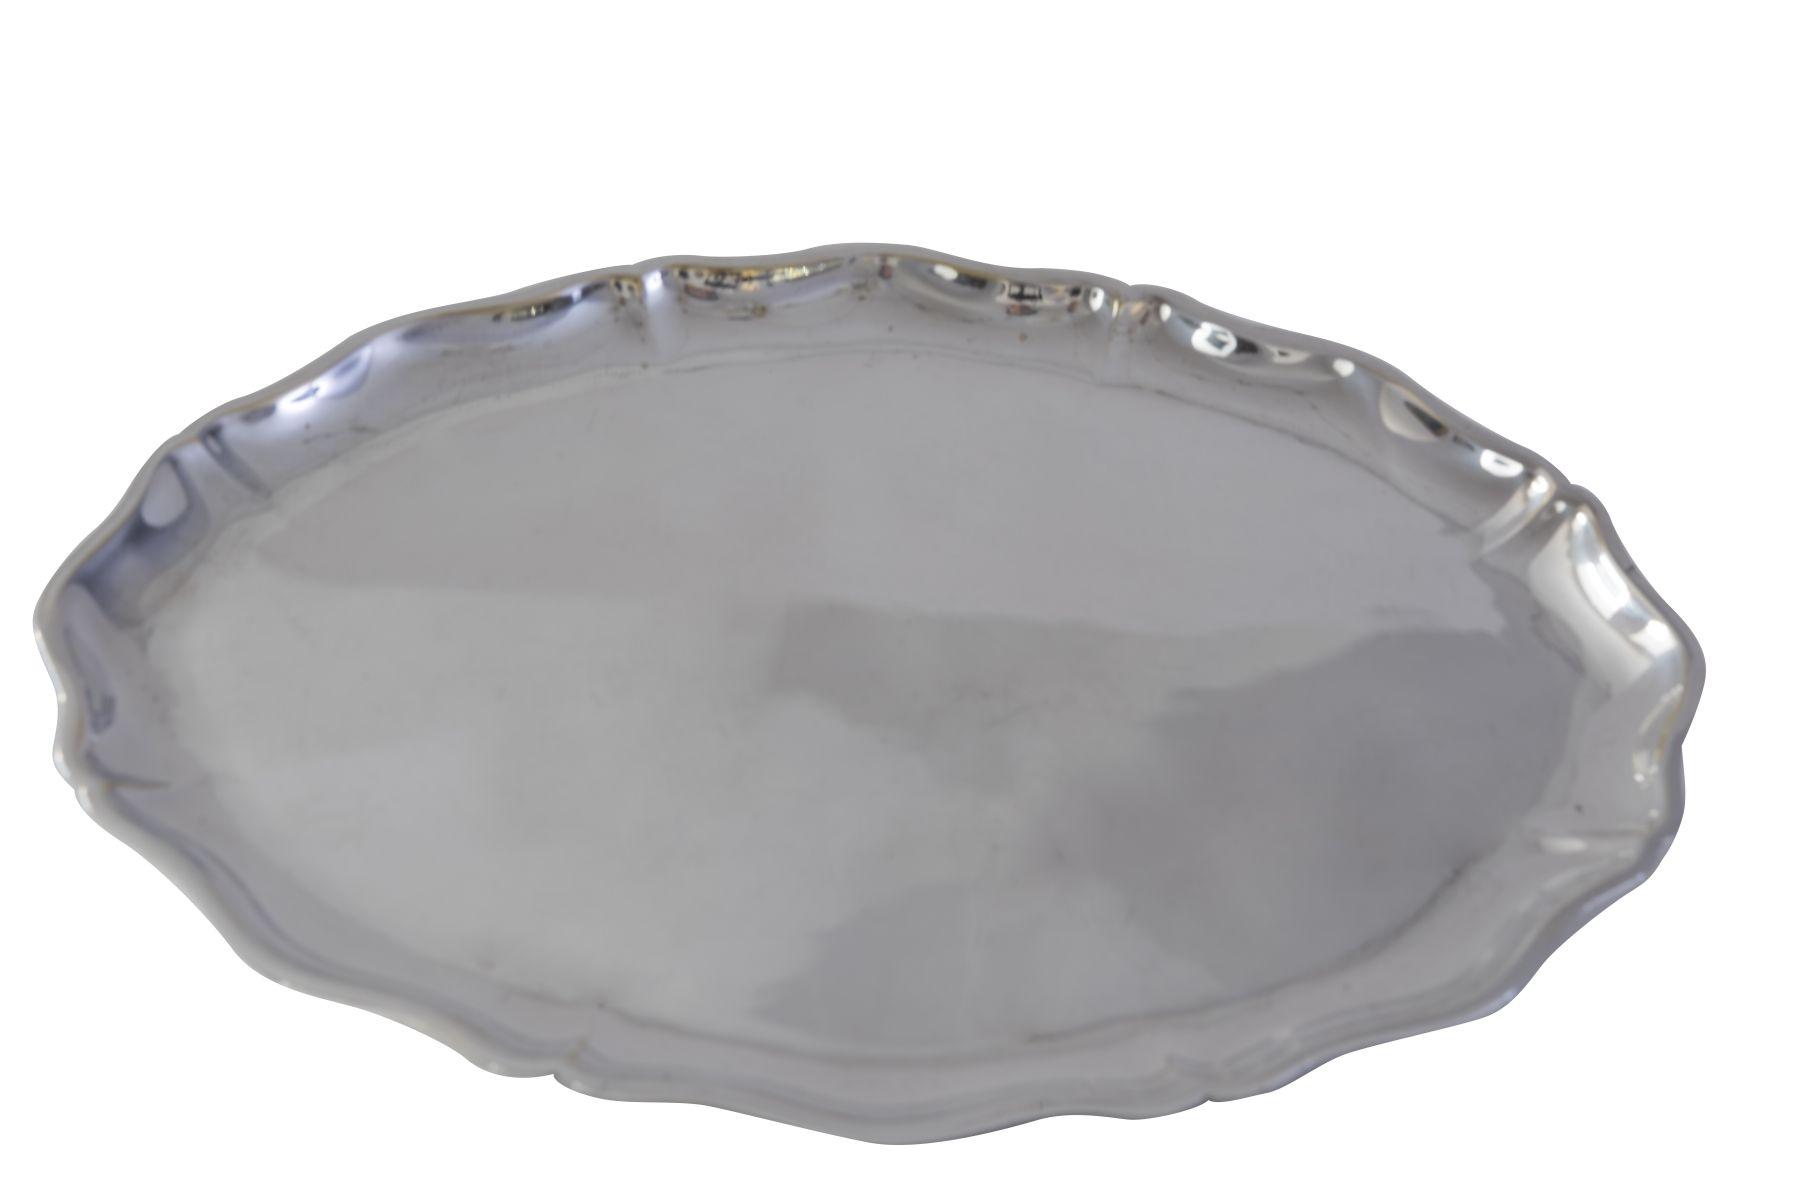 #106 Silver Tray | Silbertablett Image